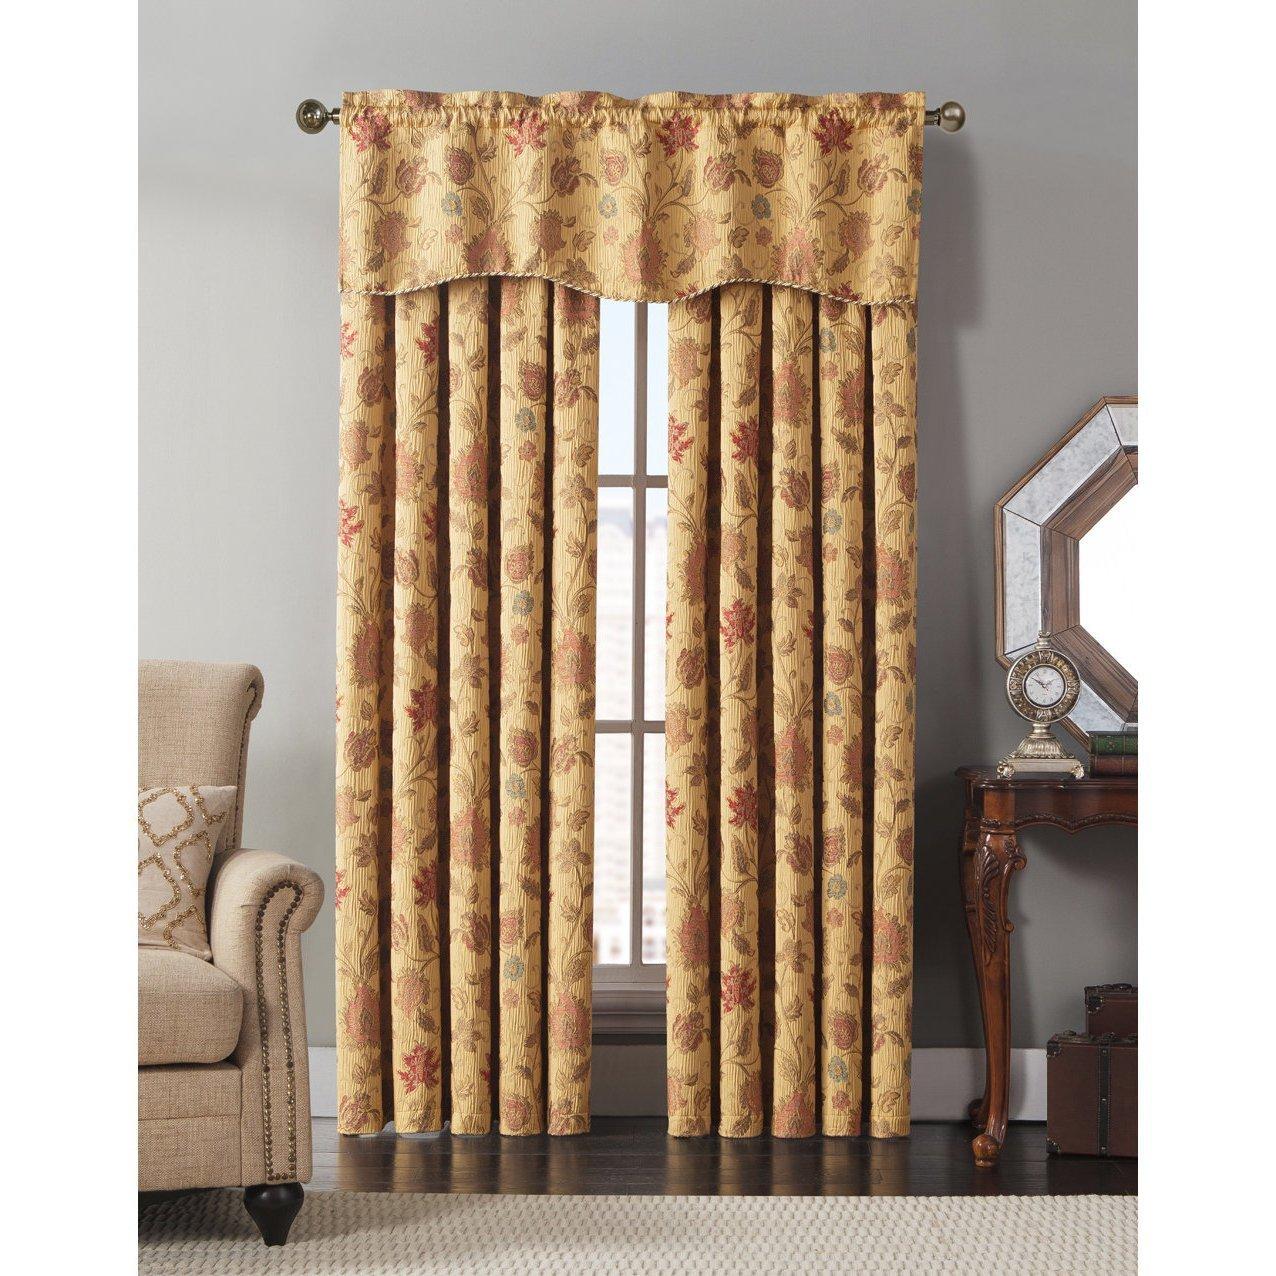 Garden window coverings  girls golden yellow jewel floral window curtain  inch single panel